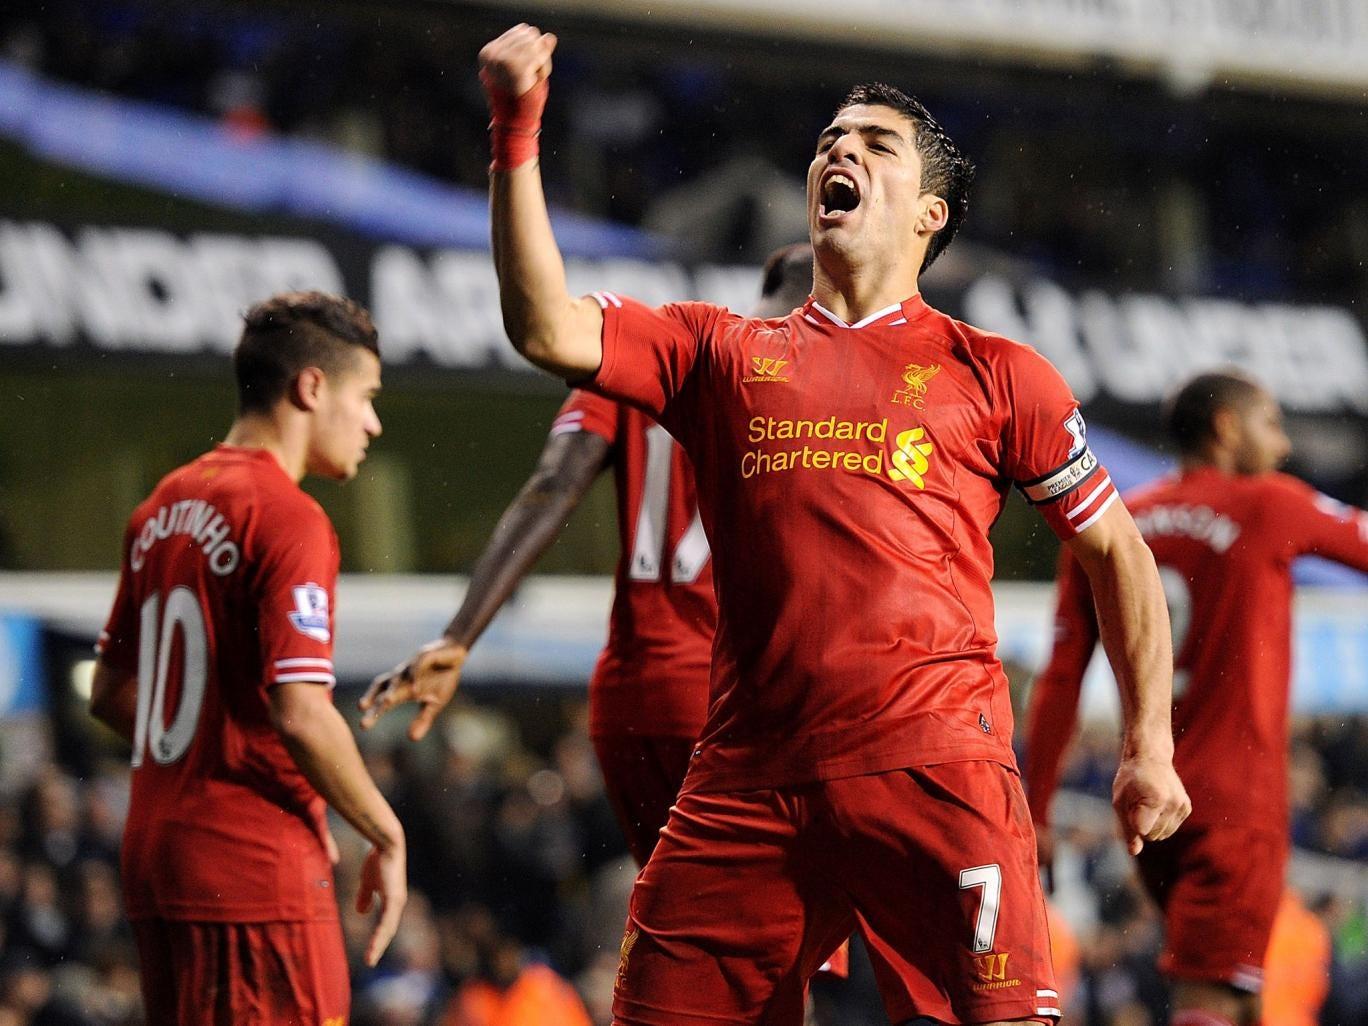 Liverpool striker Luis Suarez celebrates after scoring against Tottenham